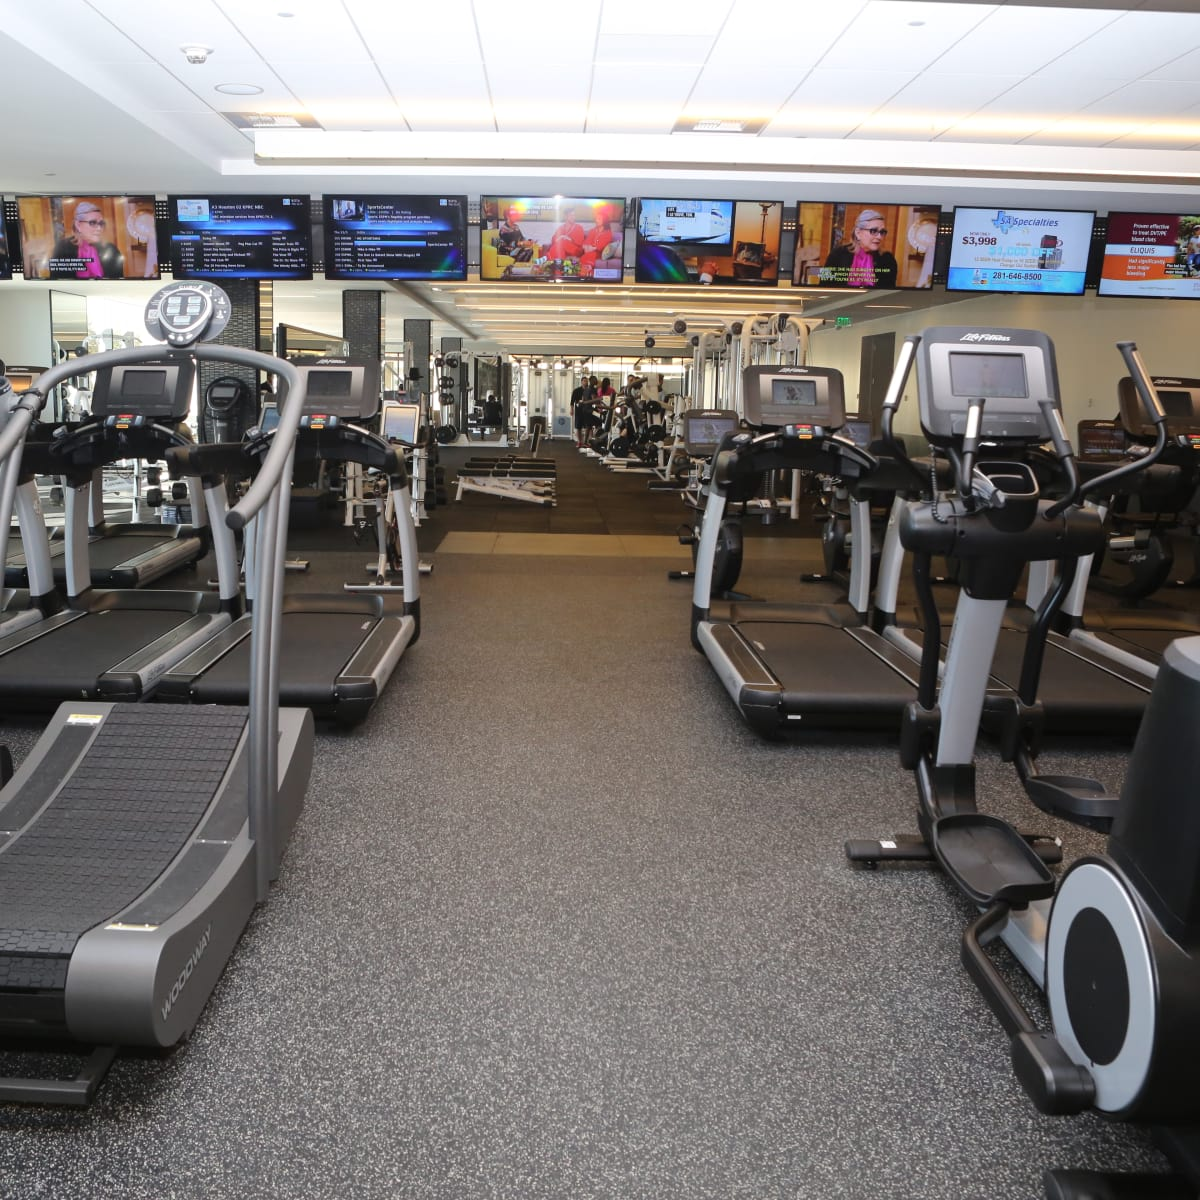 Cardio center at Equinox River Oaks District